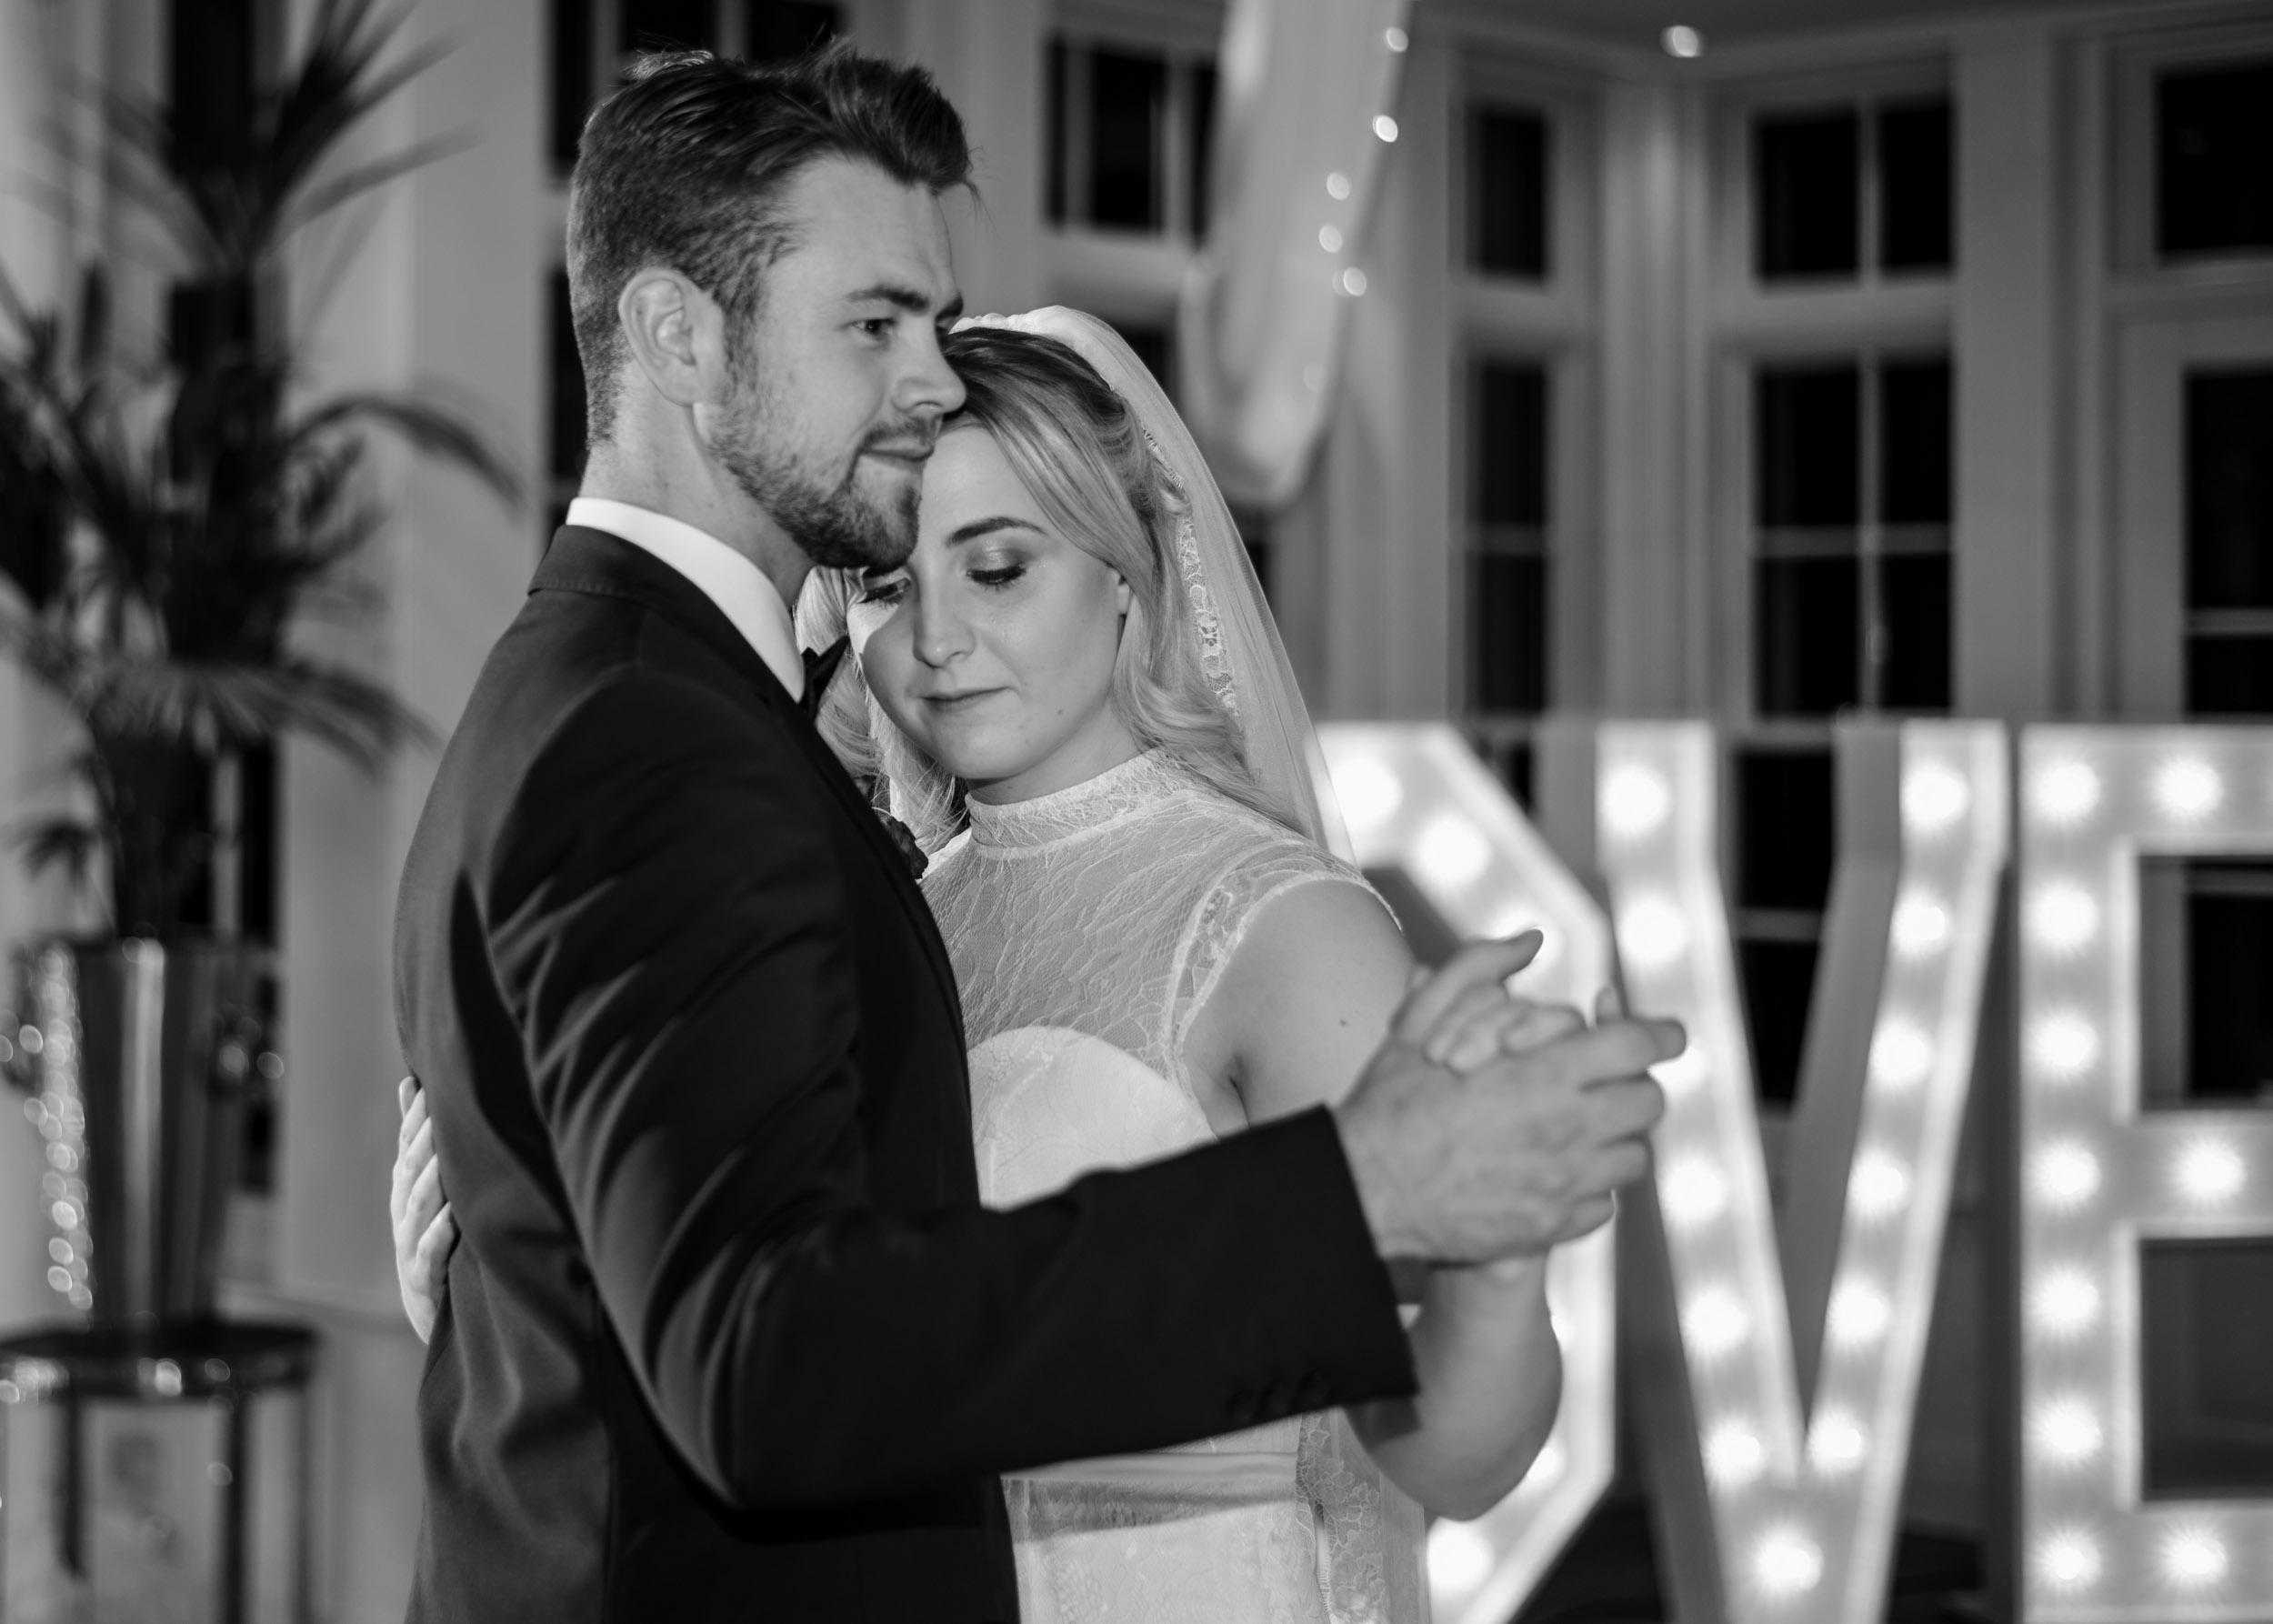 Mitton Hall, Wedding Venue Lancashire, Styled Wedding Workshop50